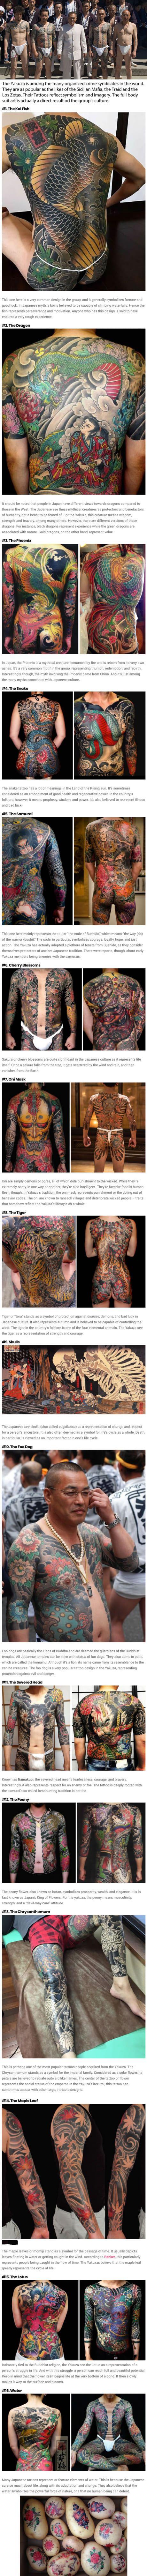 fascinating japanese yakuza tattoos and their hidden symbolic